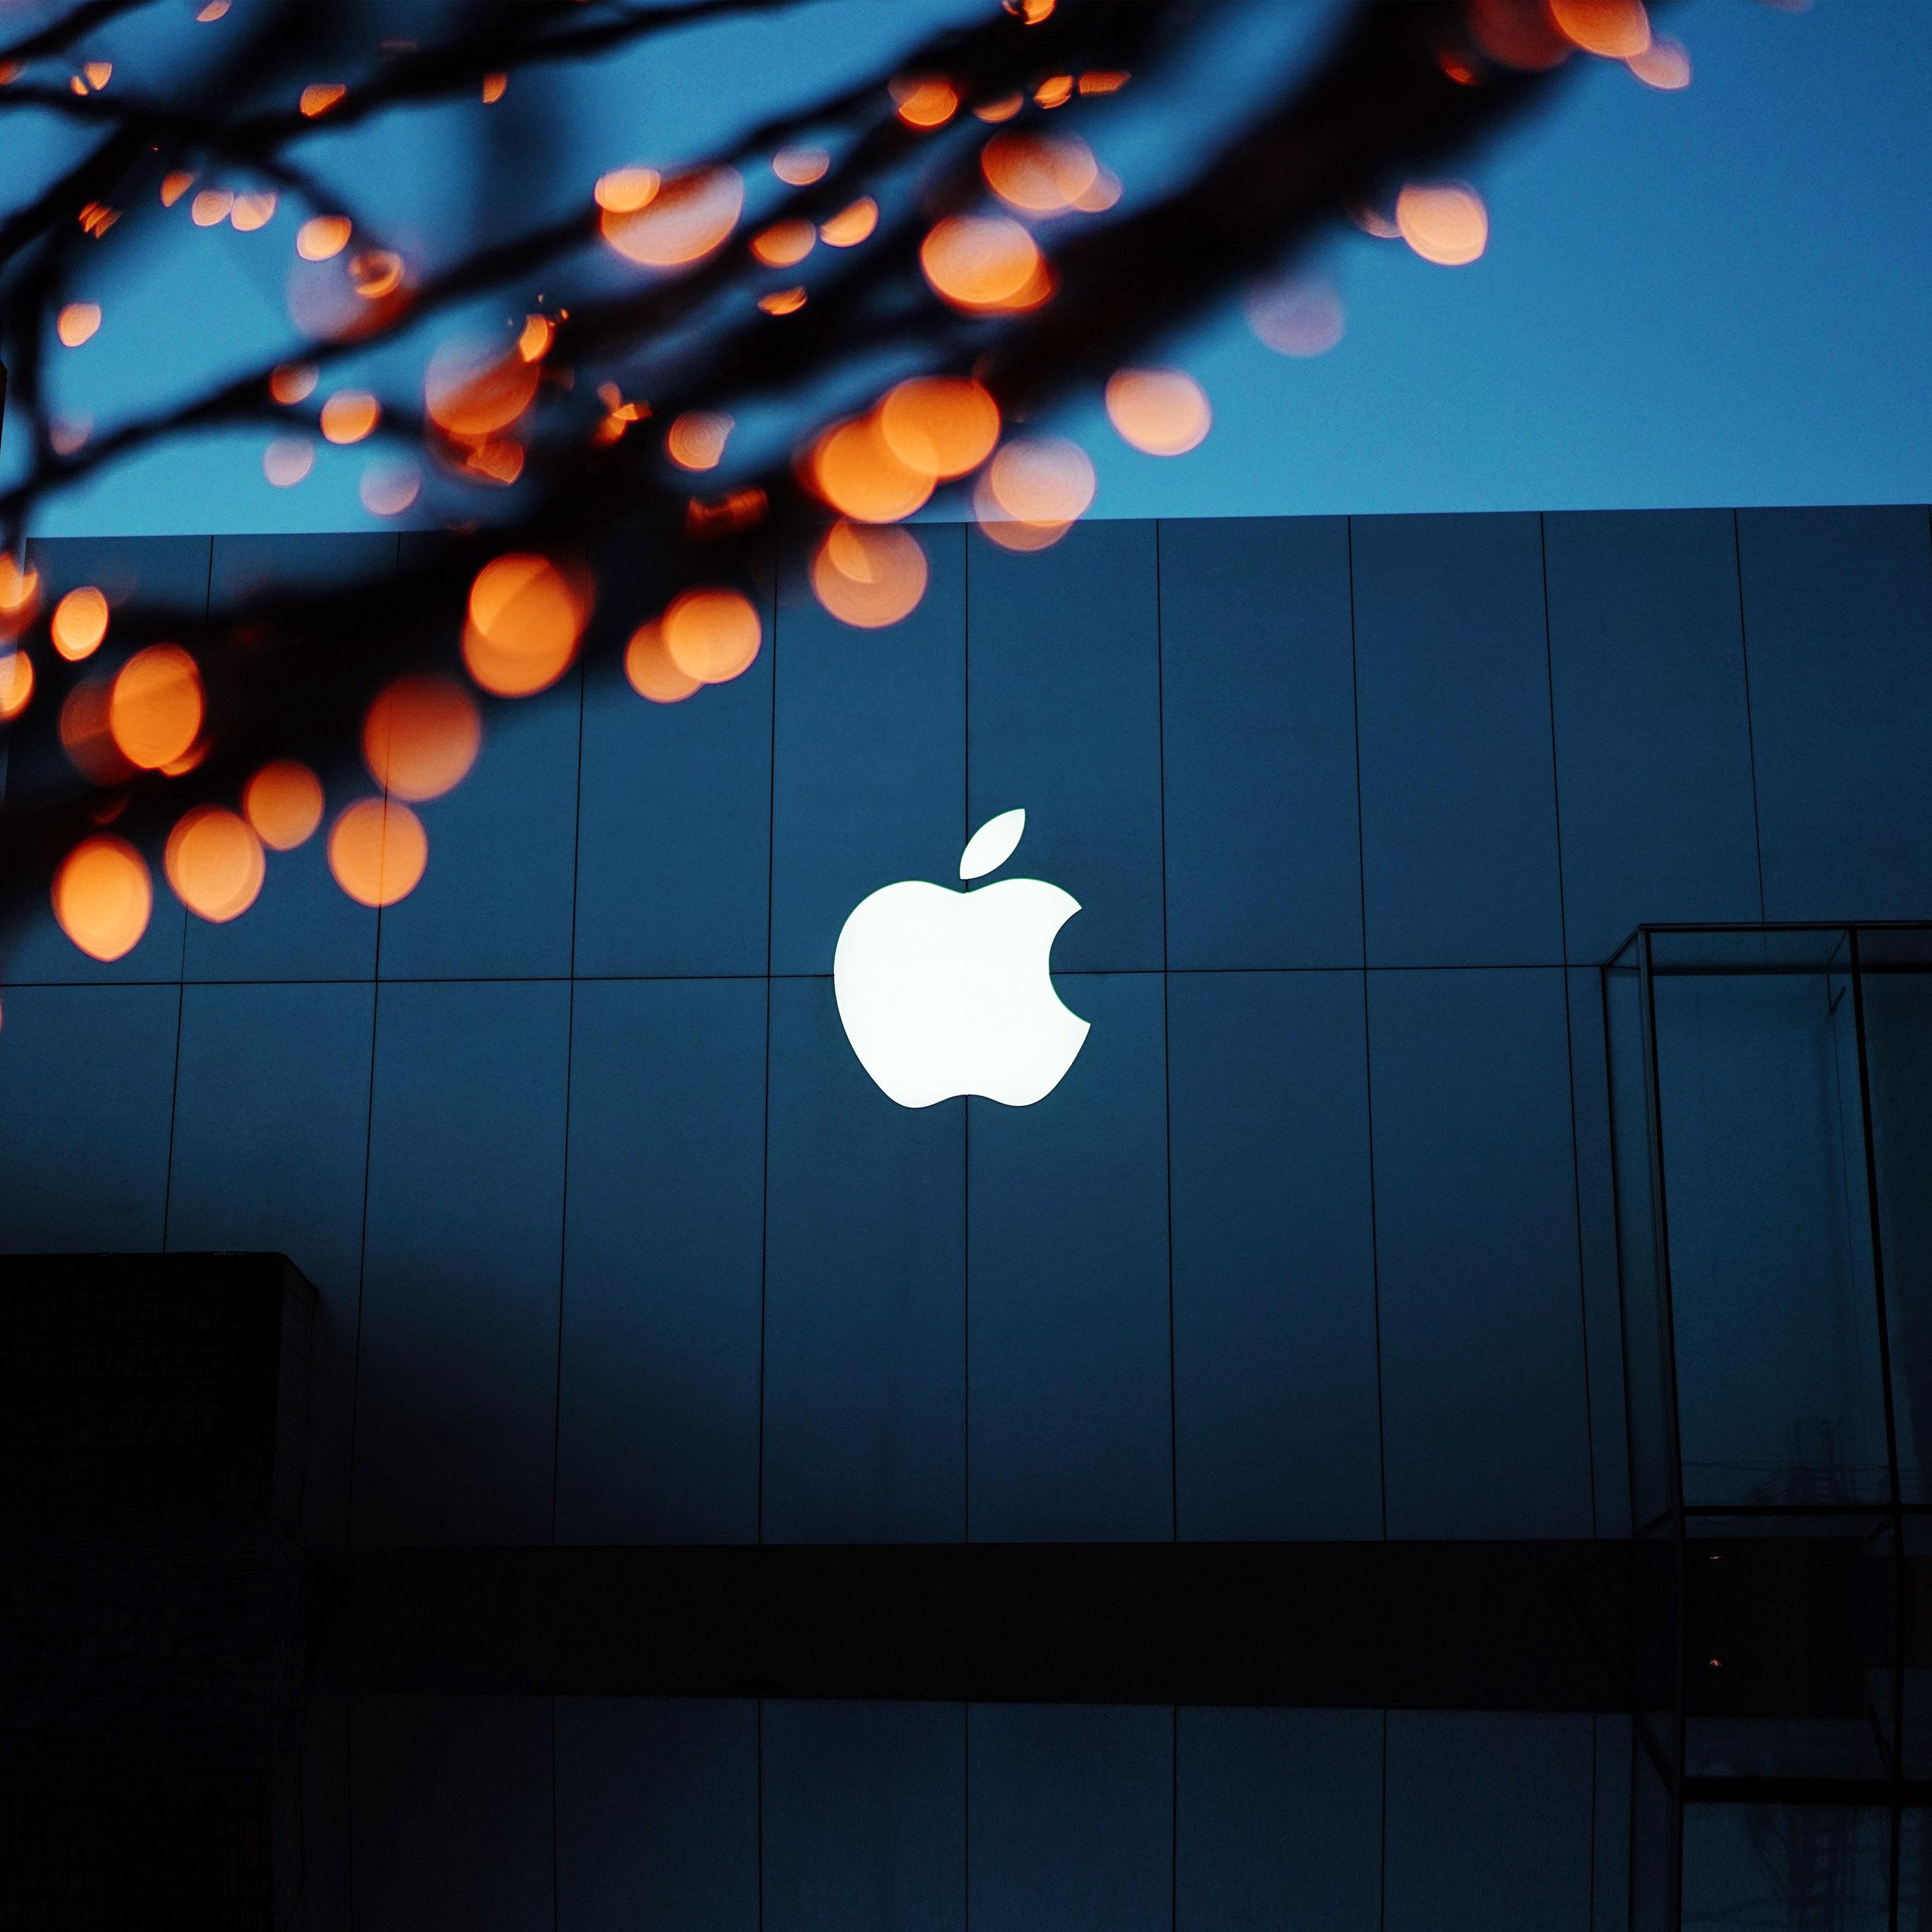 papers.co ng08 apple logo blue orange dark 40 wallpaper